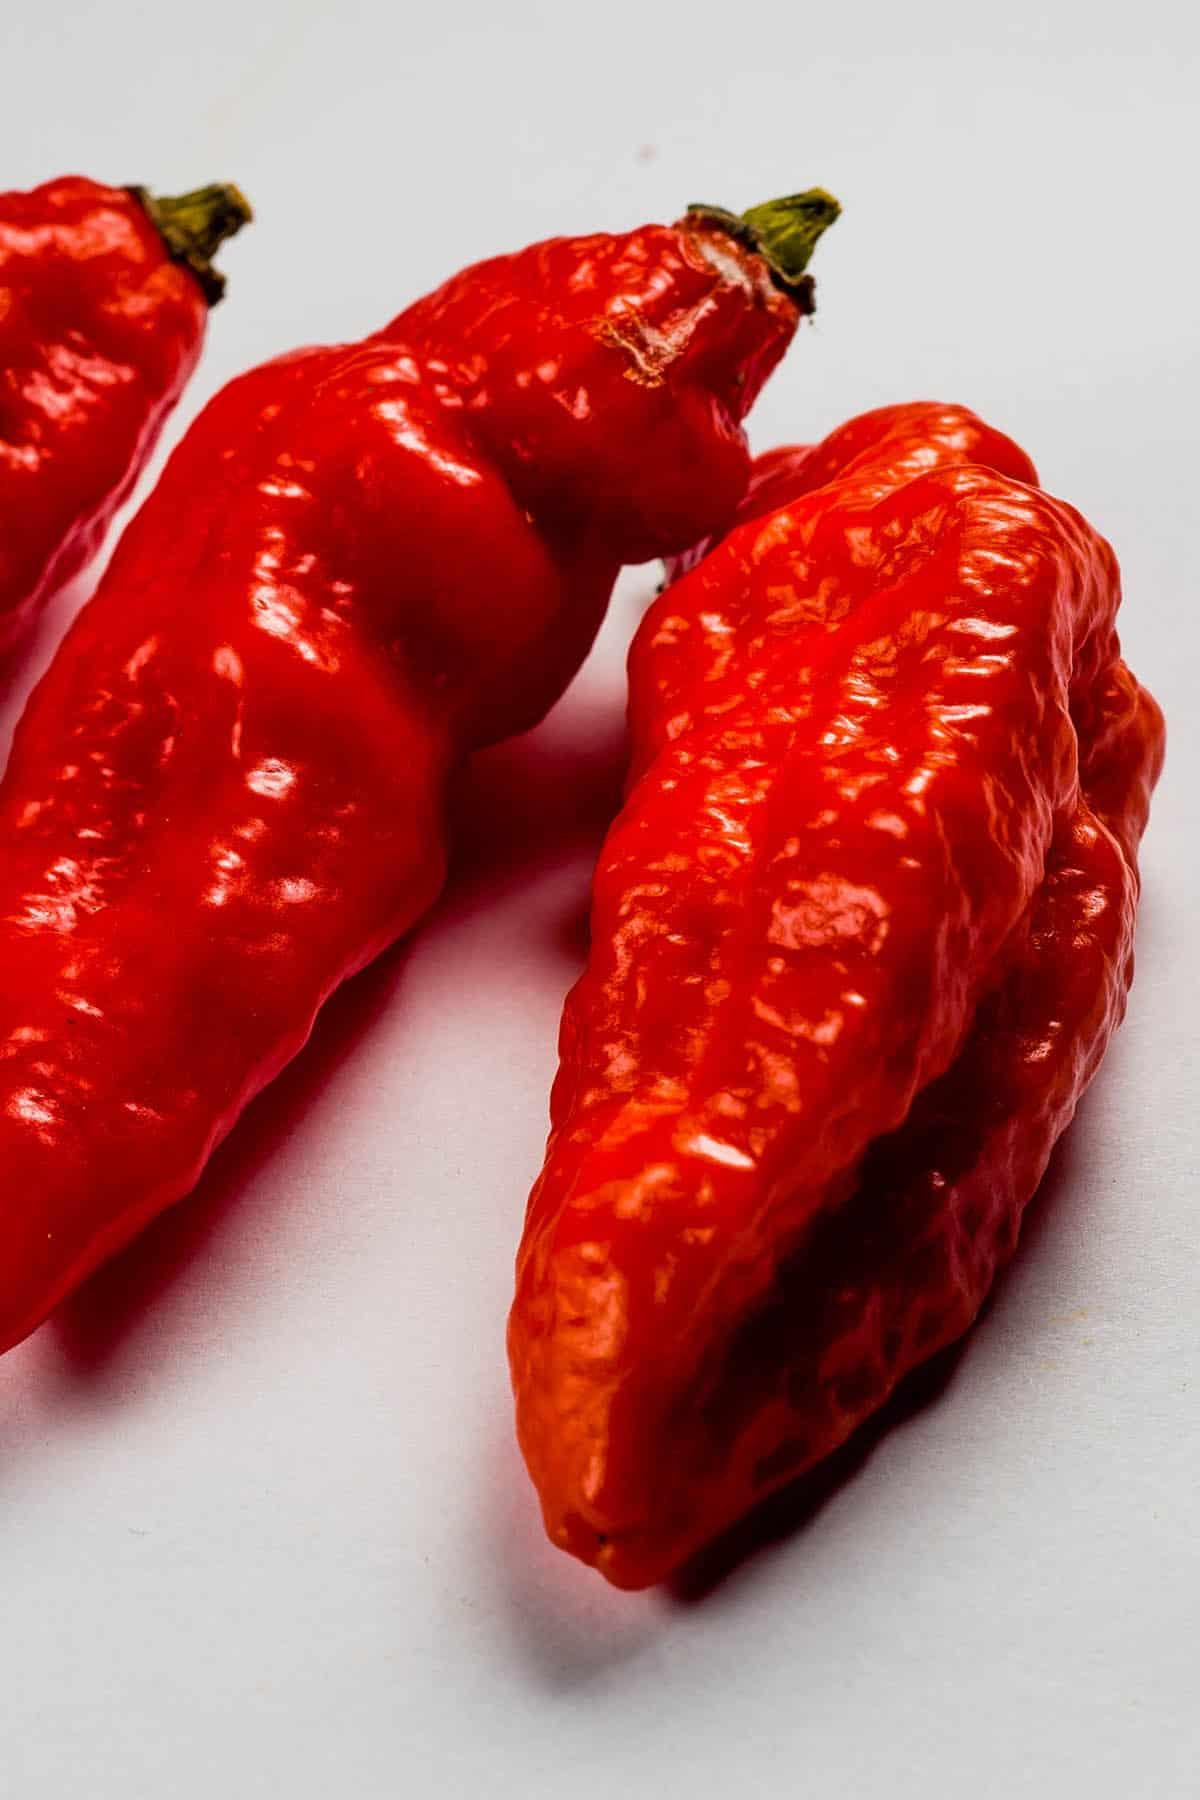 Gibralta / Spanish Naga Chili Peppers